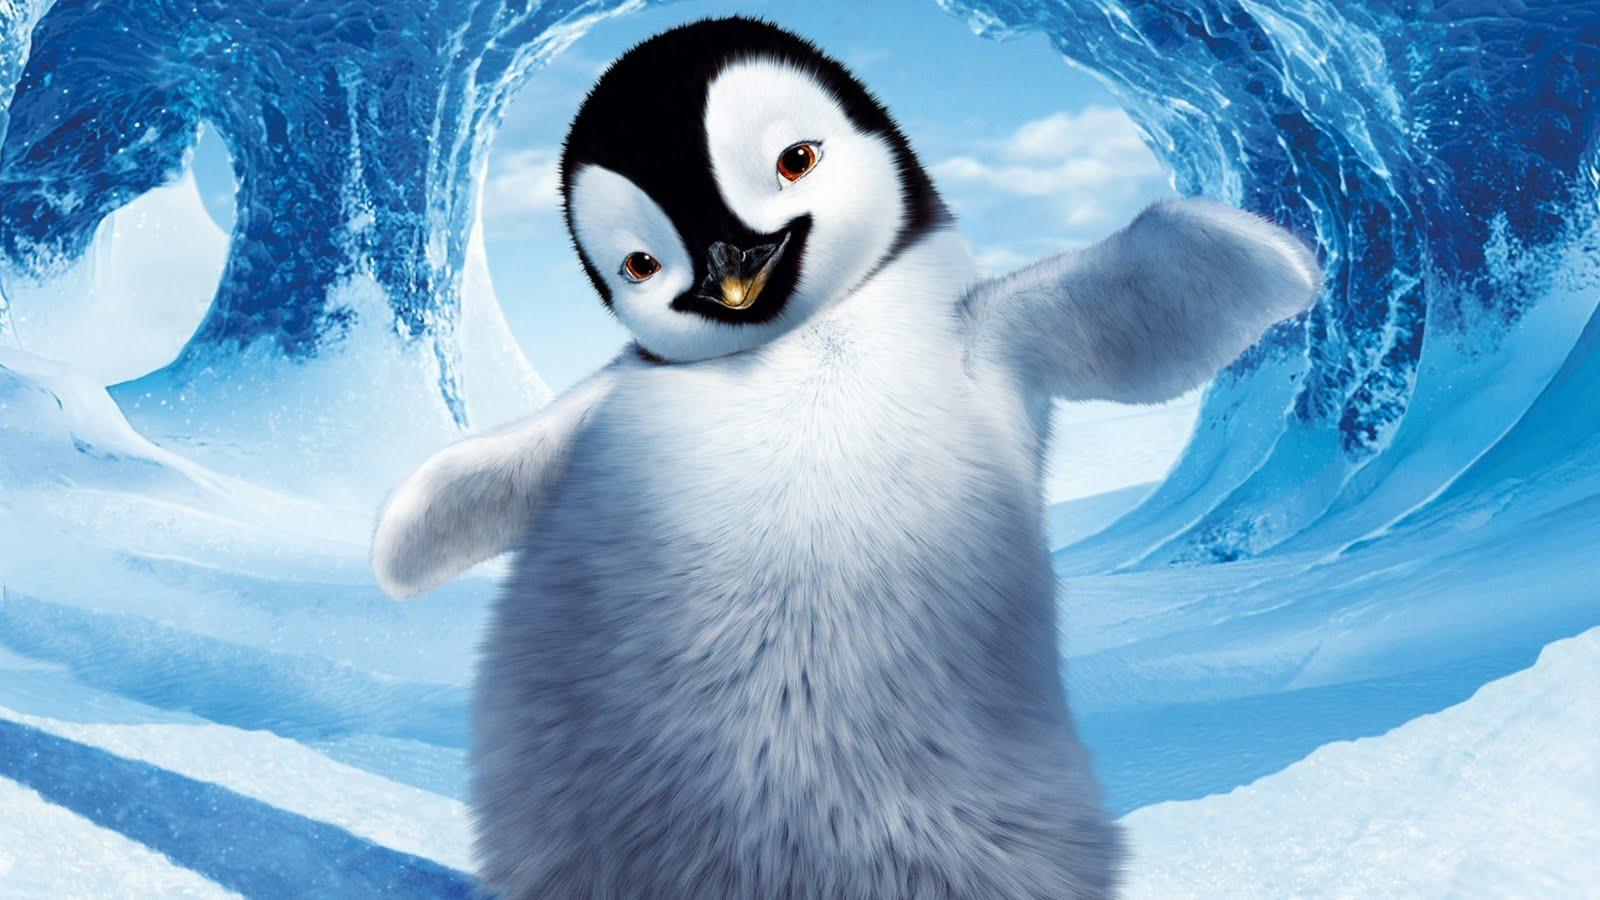 http://3.bp.blogspot.com/-OSQQOQNDme0/TmOLpjjJBTI/AAAAAAAAAyk/QZHzaBLC5ug/s1600/Happy-Feet_Cartton_cinema_3d_penguin_www.Vvallpaper.net.jpg